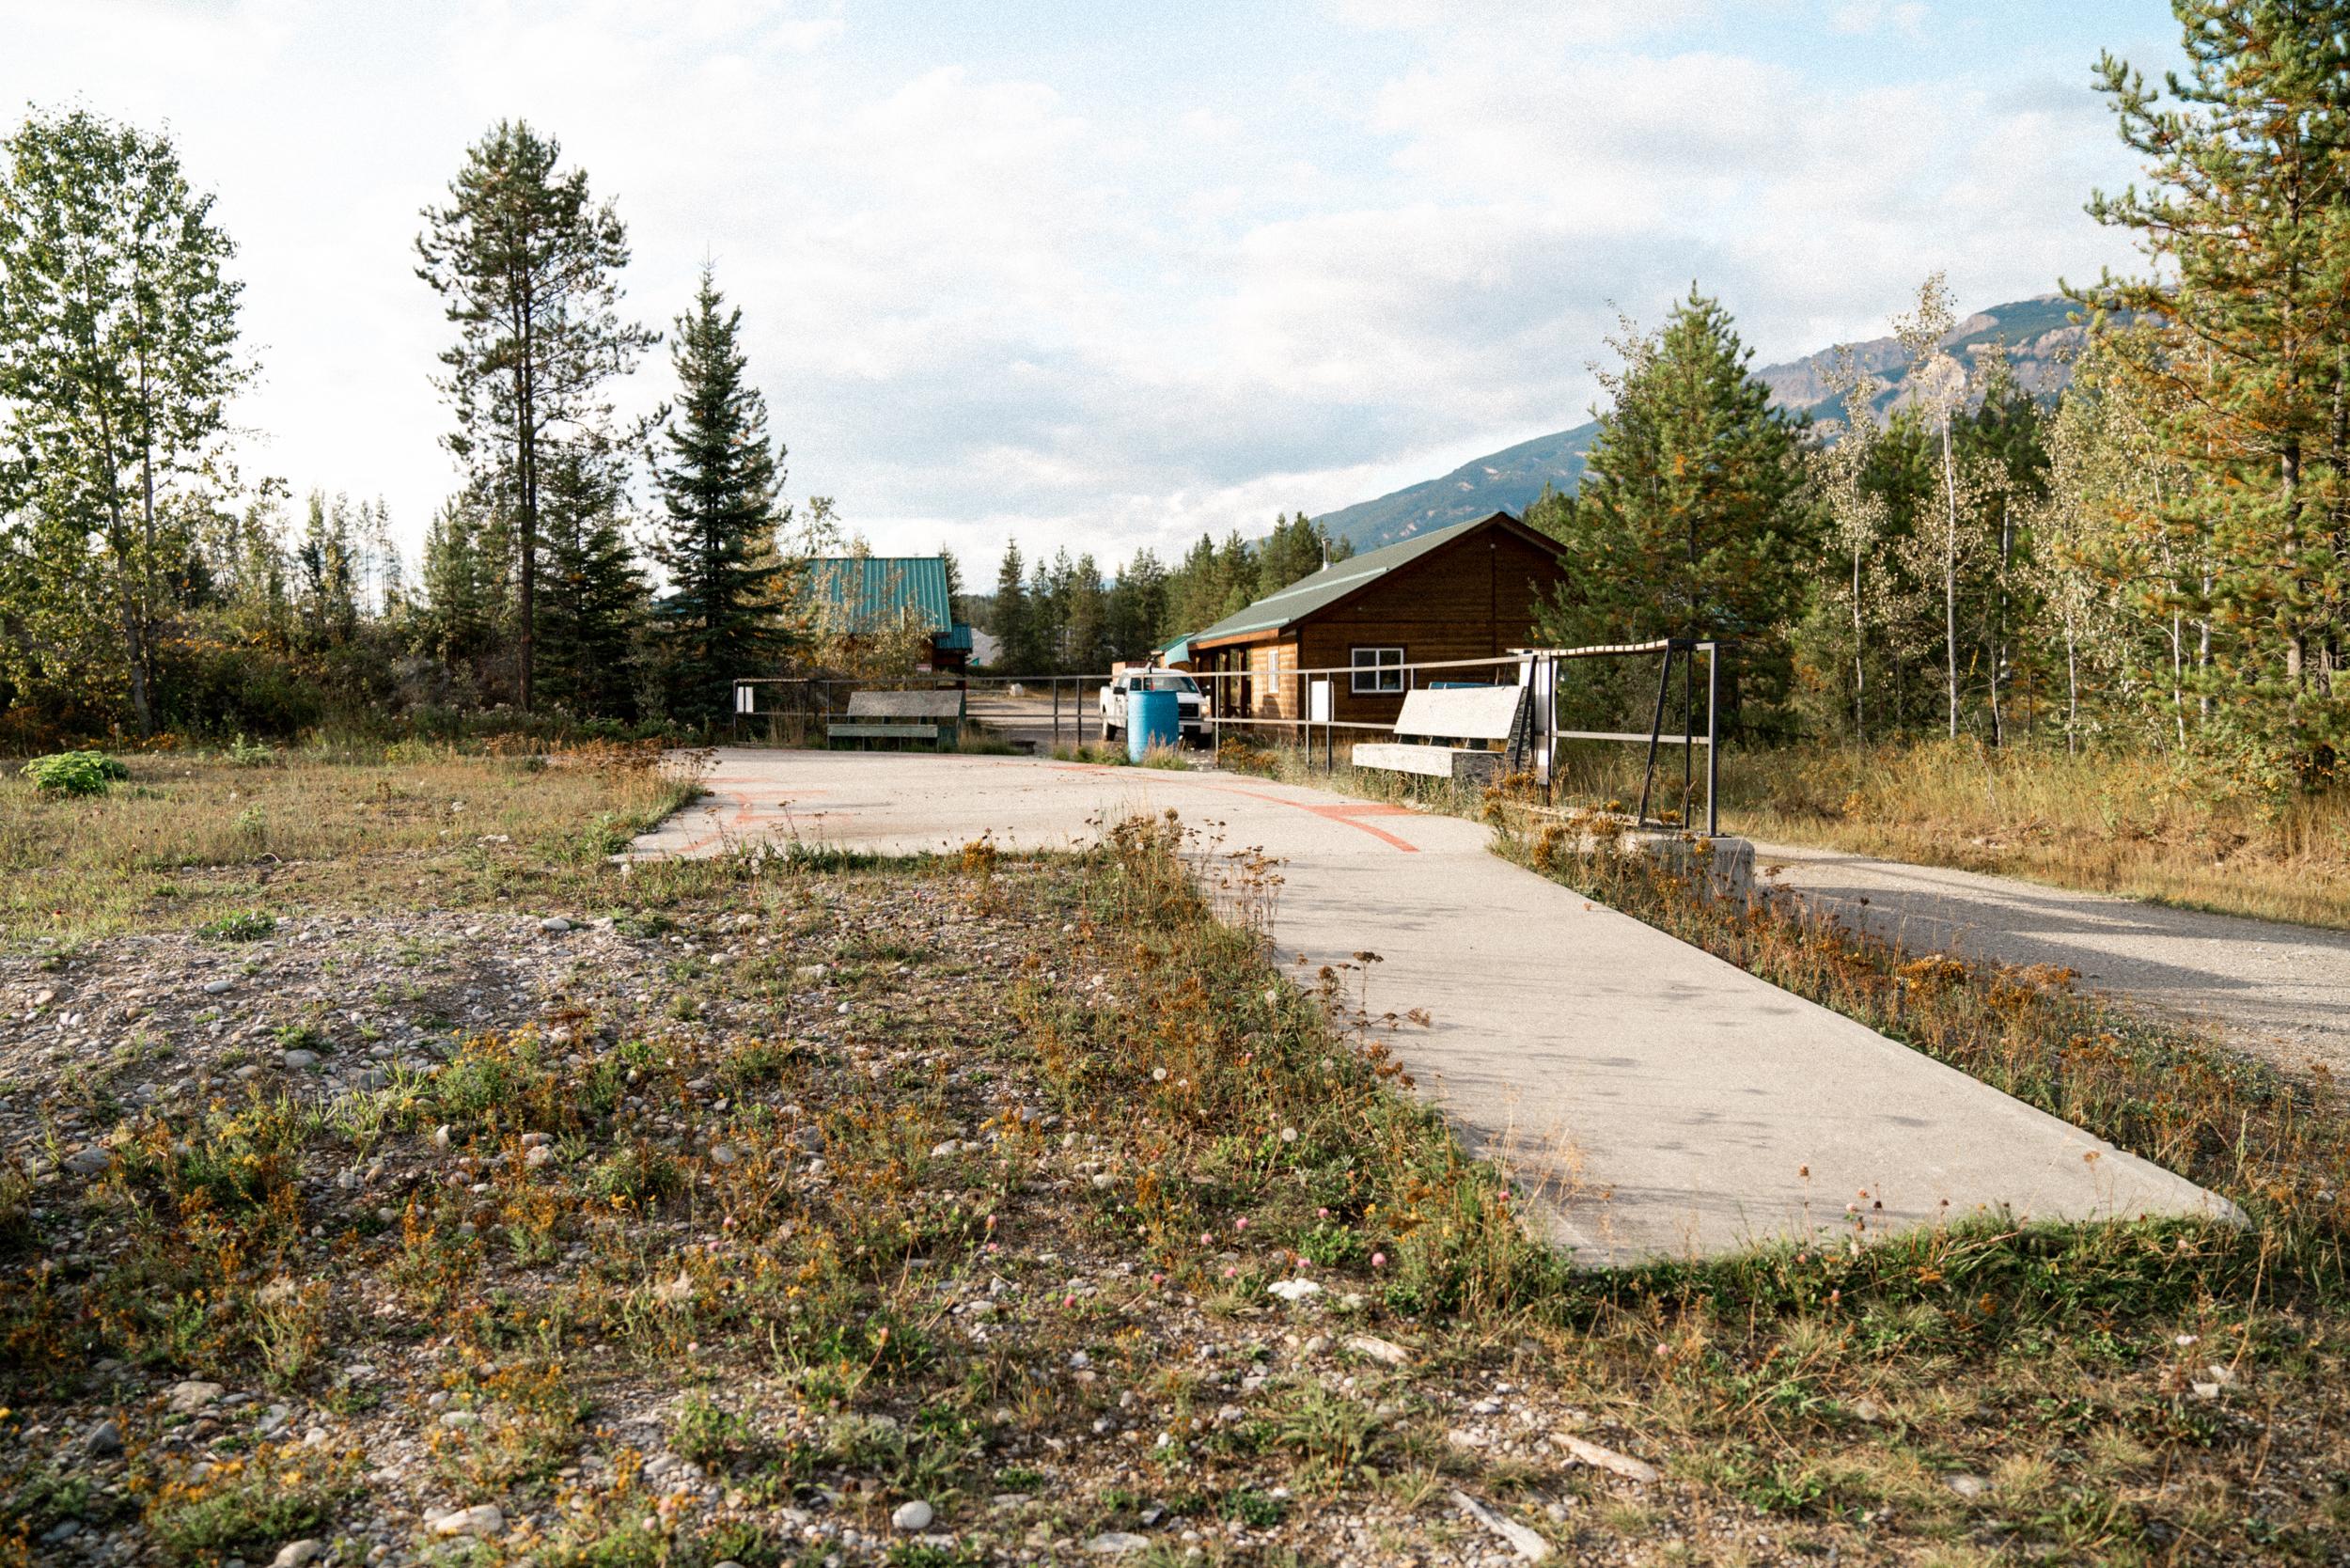 GoldenRod&GunClub-Trap Range.jpg